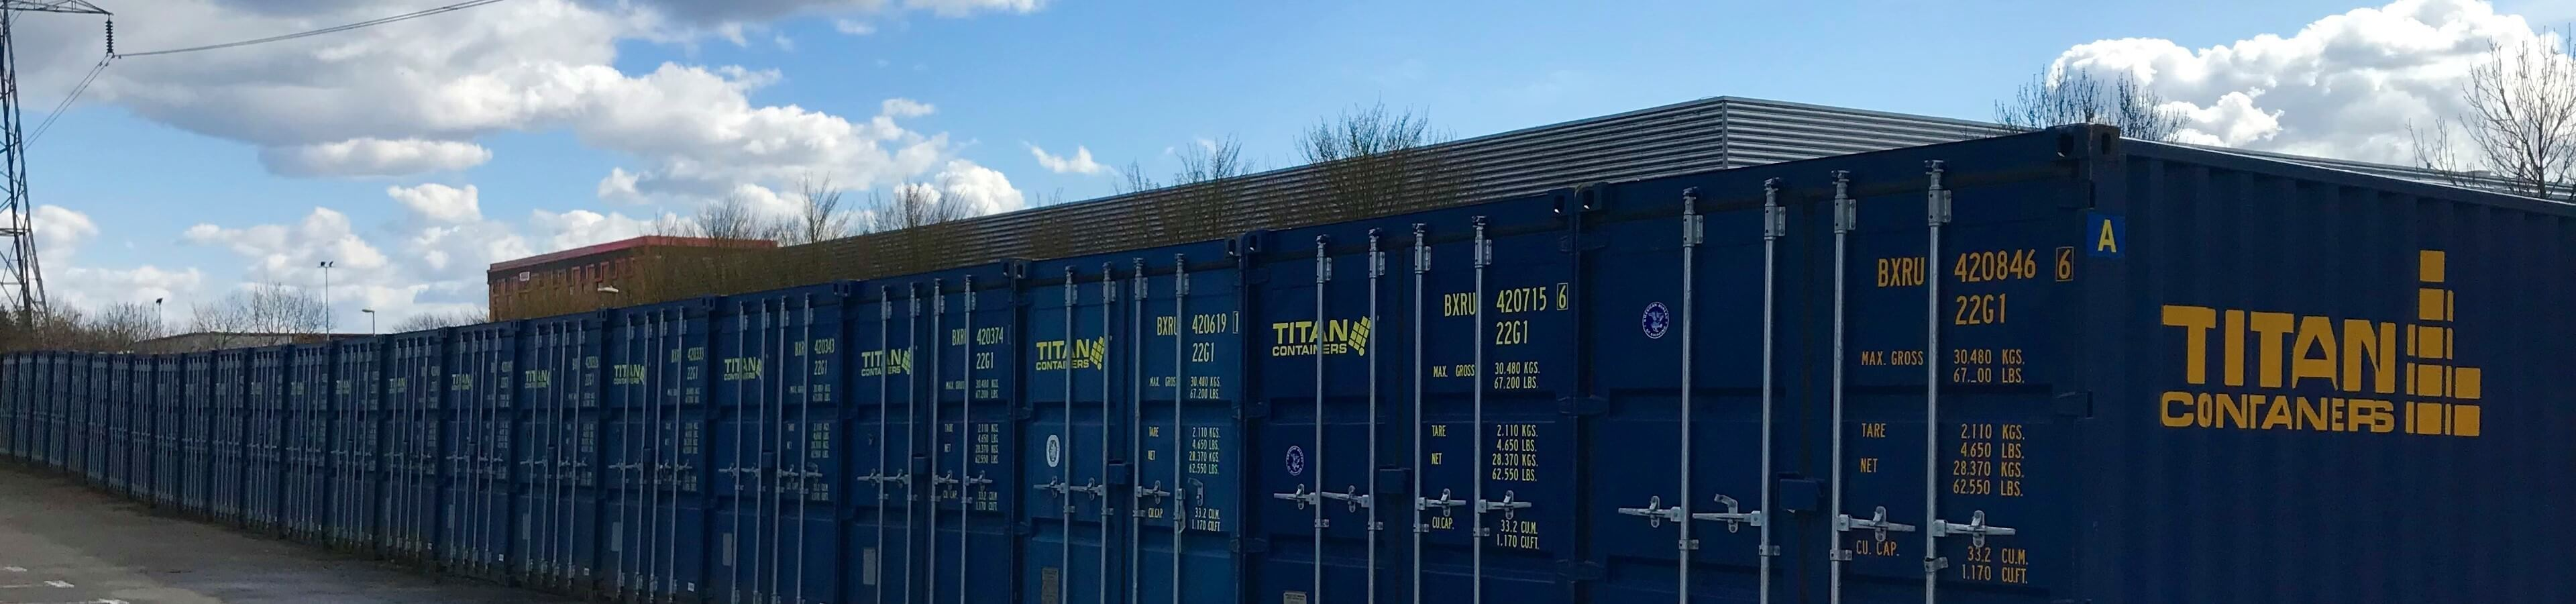 Southampton Self Storage header image | TITAN Containers